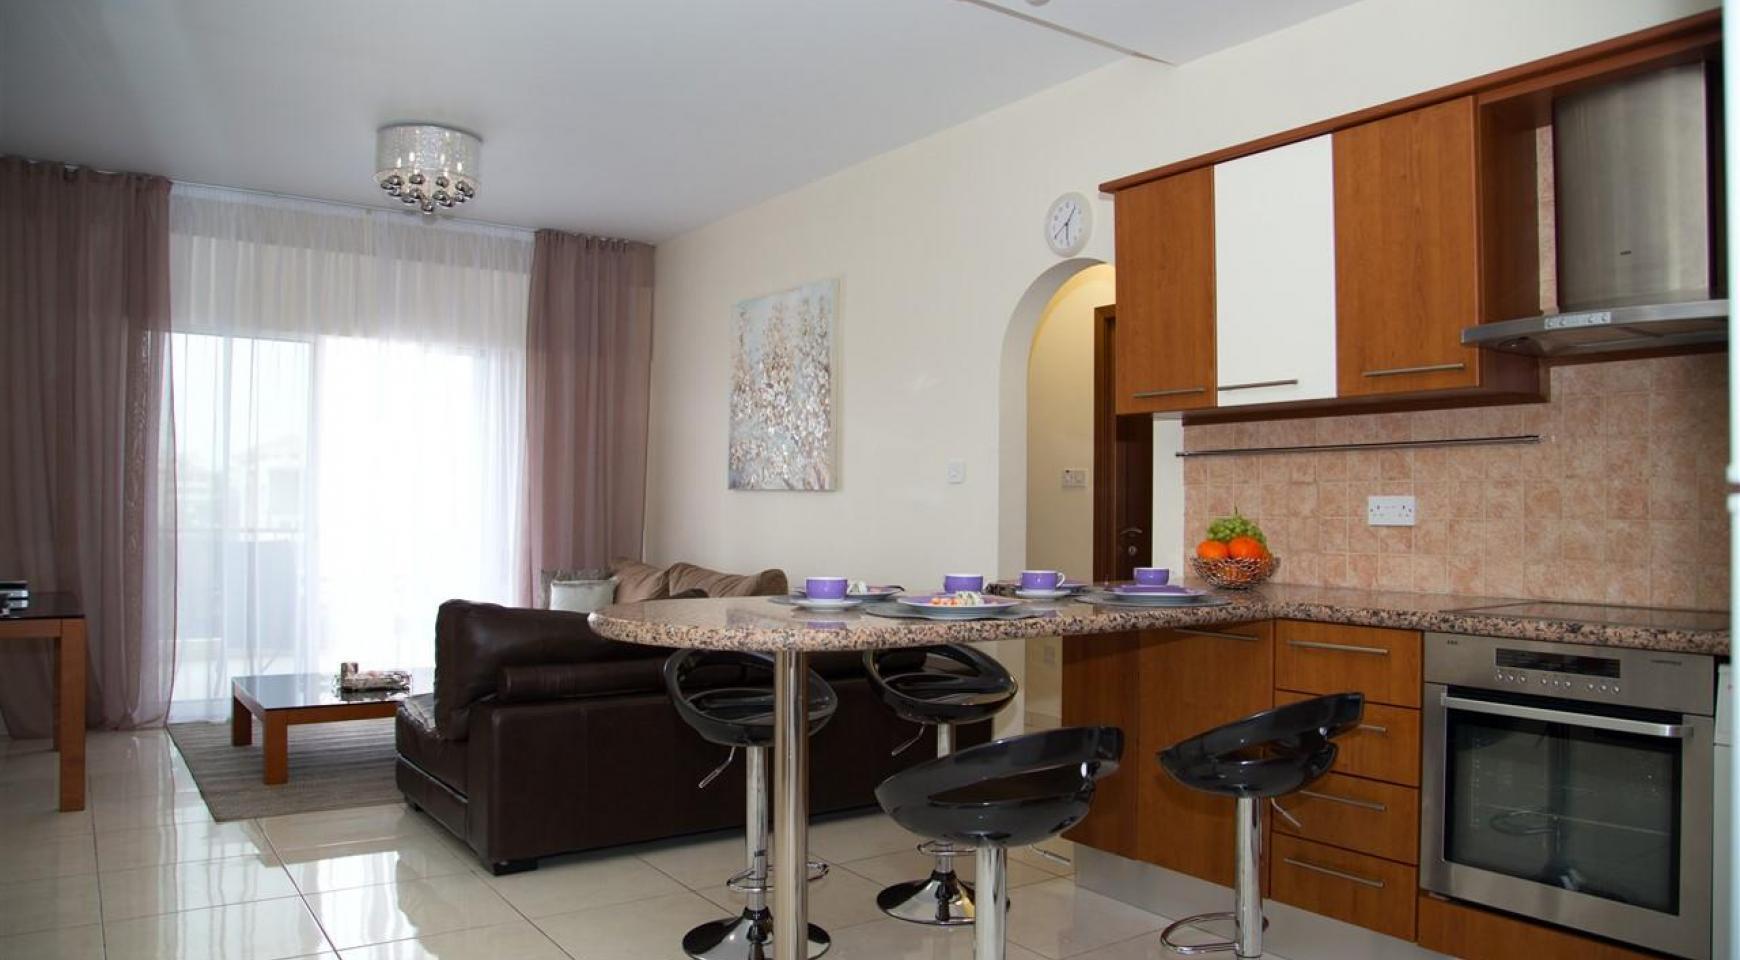 Luxury 2 Bedroom Apartment Mesogios Iris 304 in the Tourist area near the Beach - 7